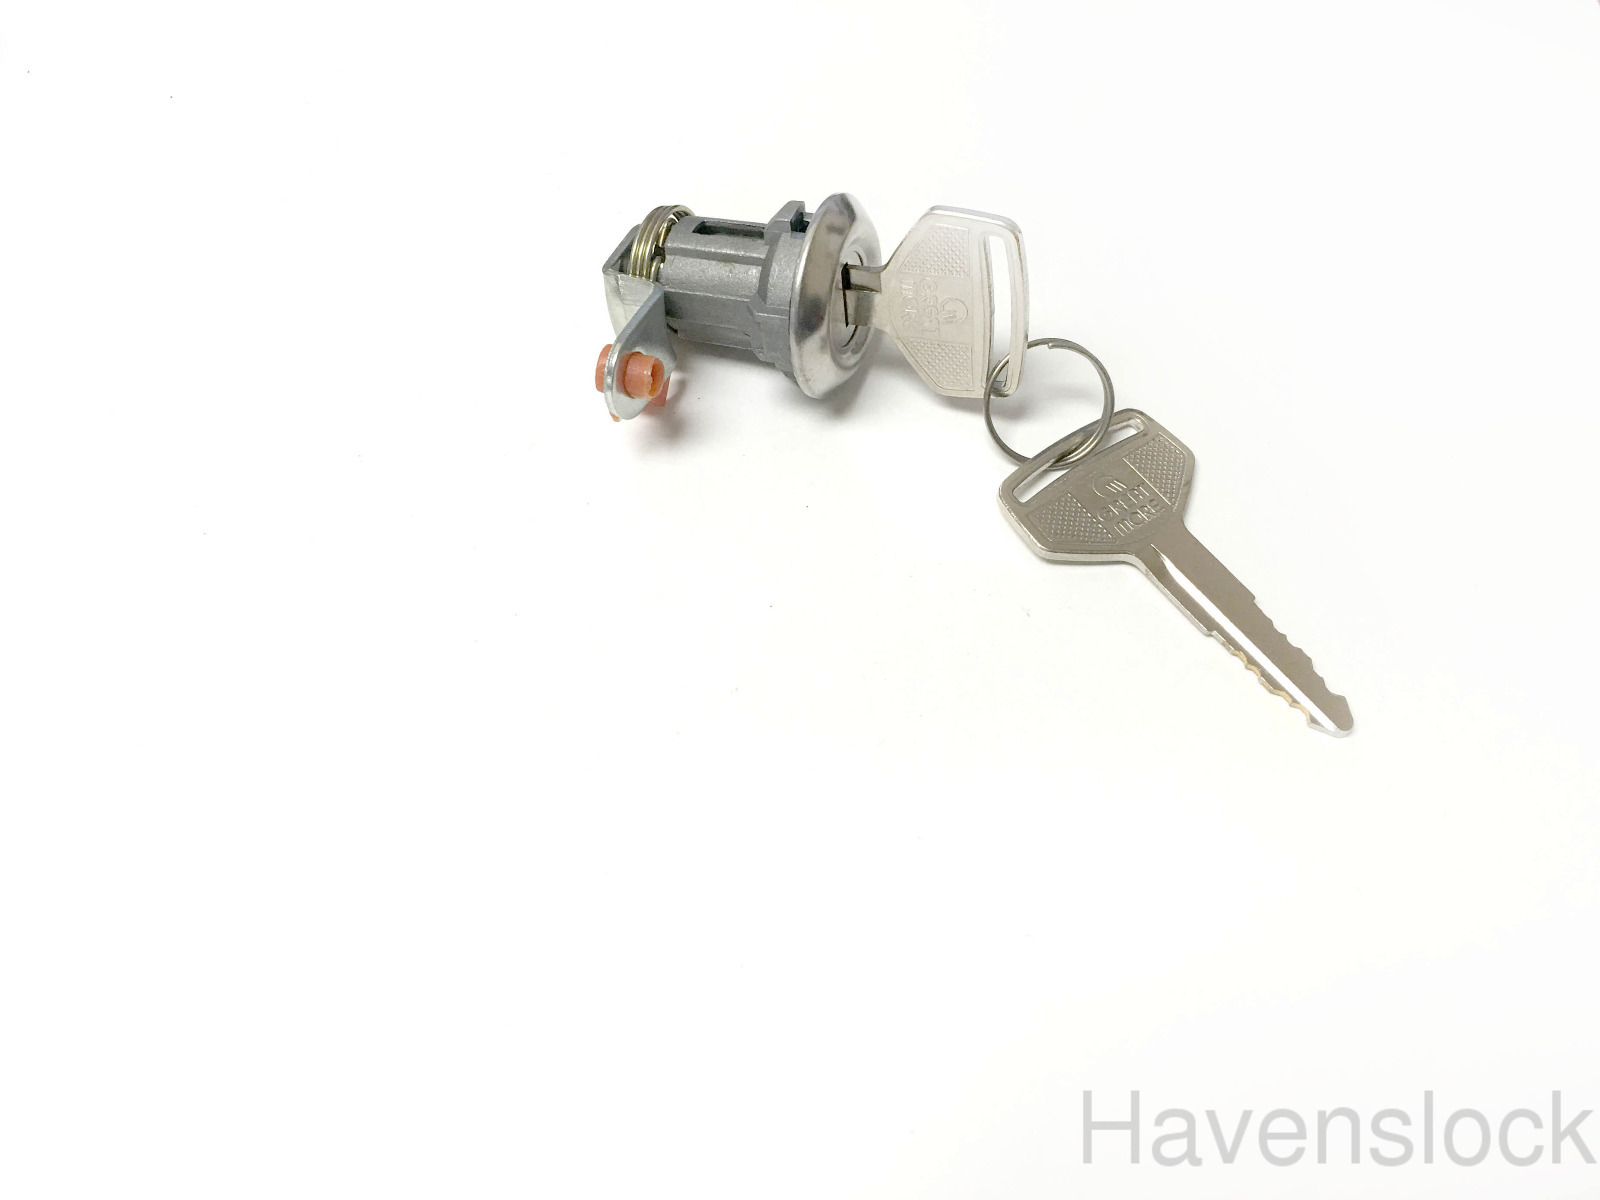 ASP Door Lock Cylinder D-30-106 for Toyota, Fits m